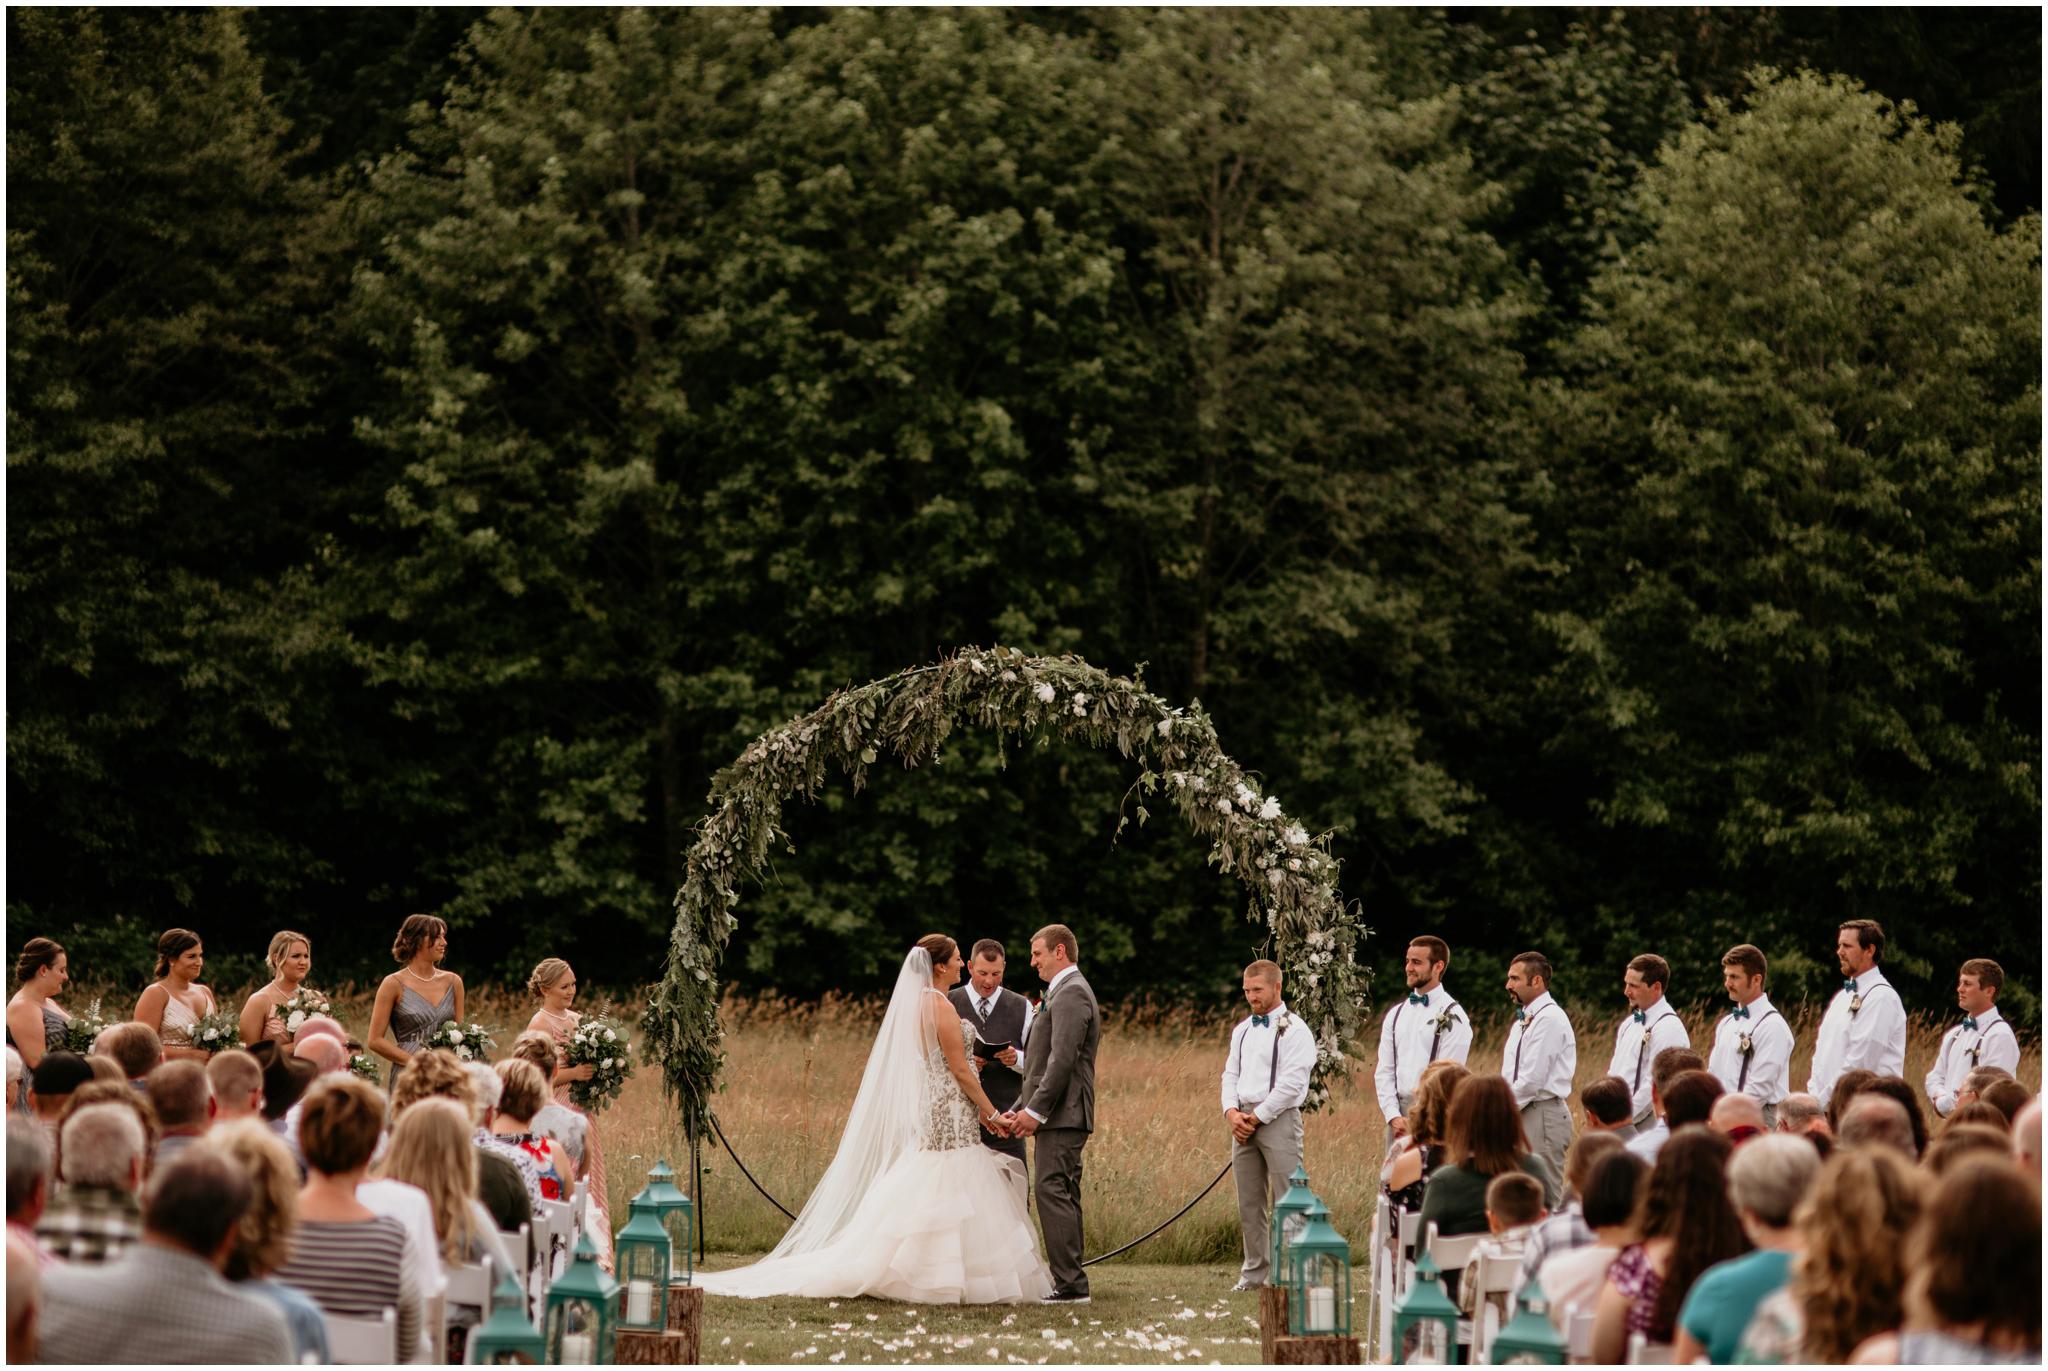 alex-and-matthew-three-cs-farm-venue-seattle-wedding-photographer-107.jpg